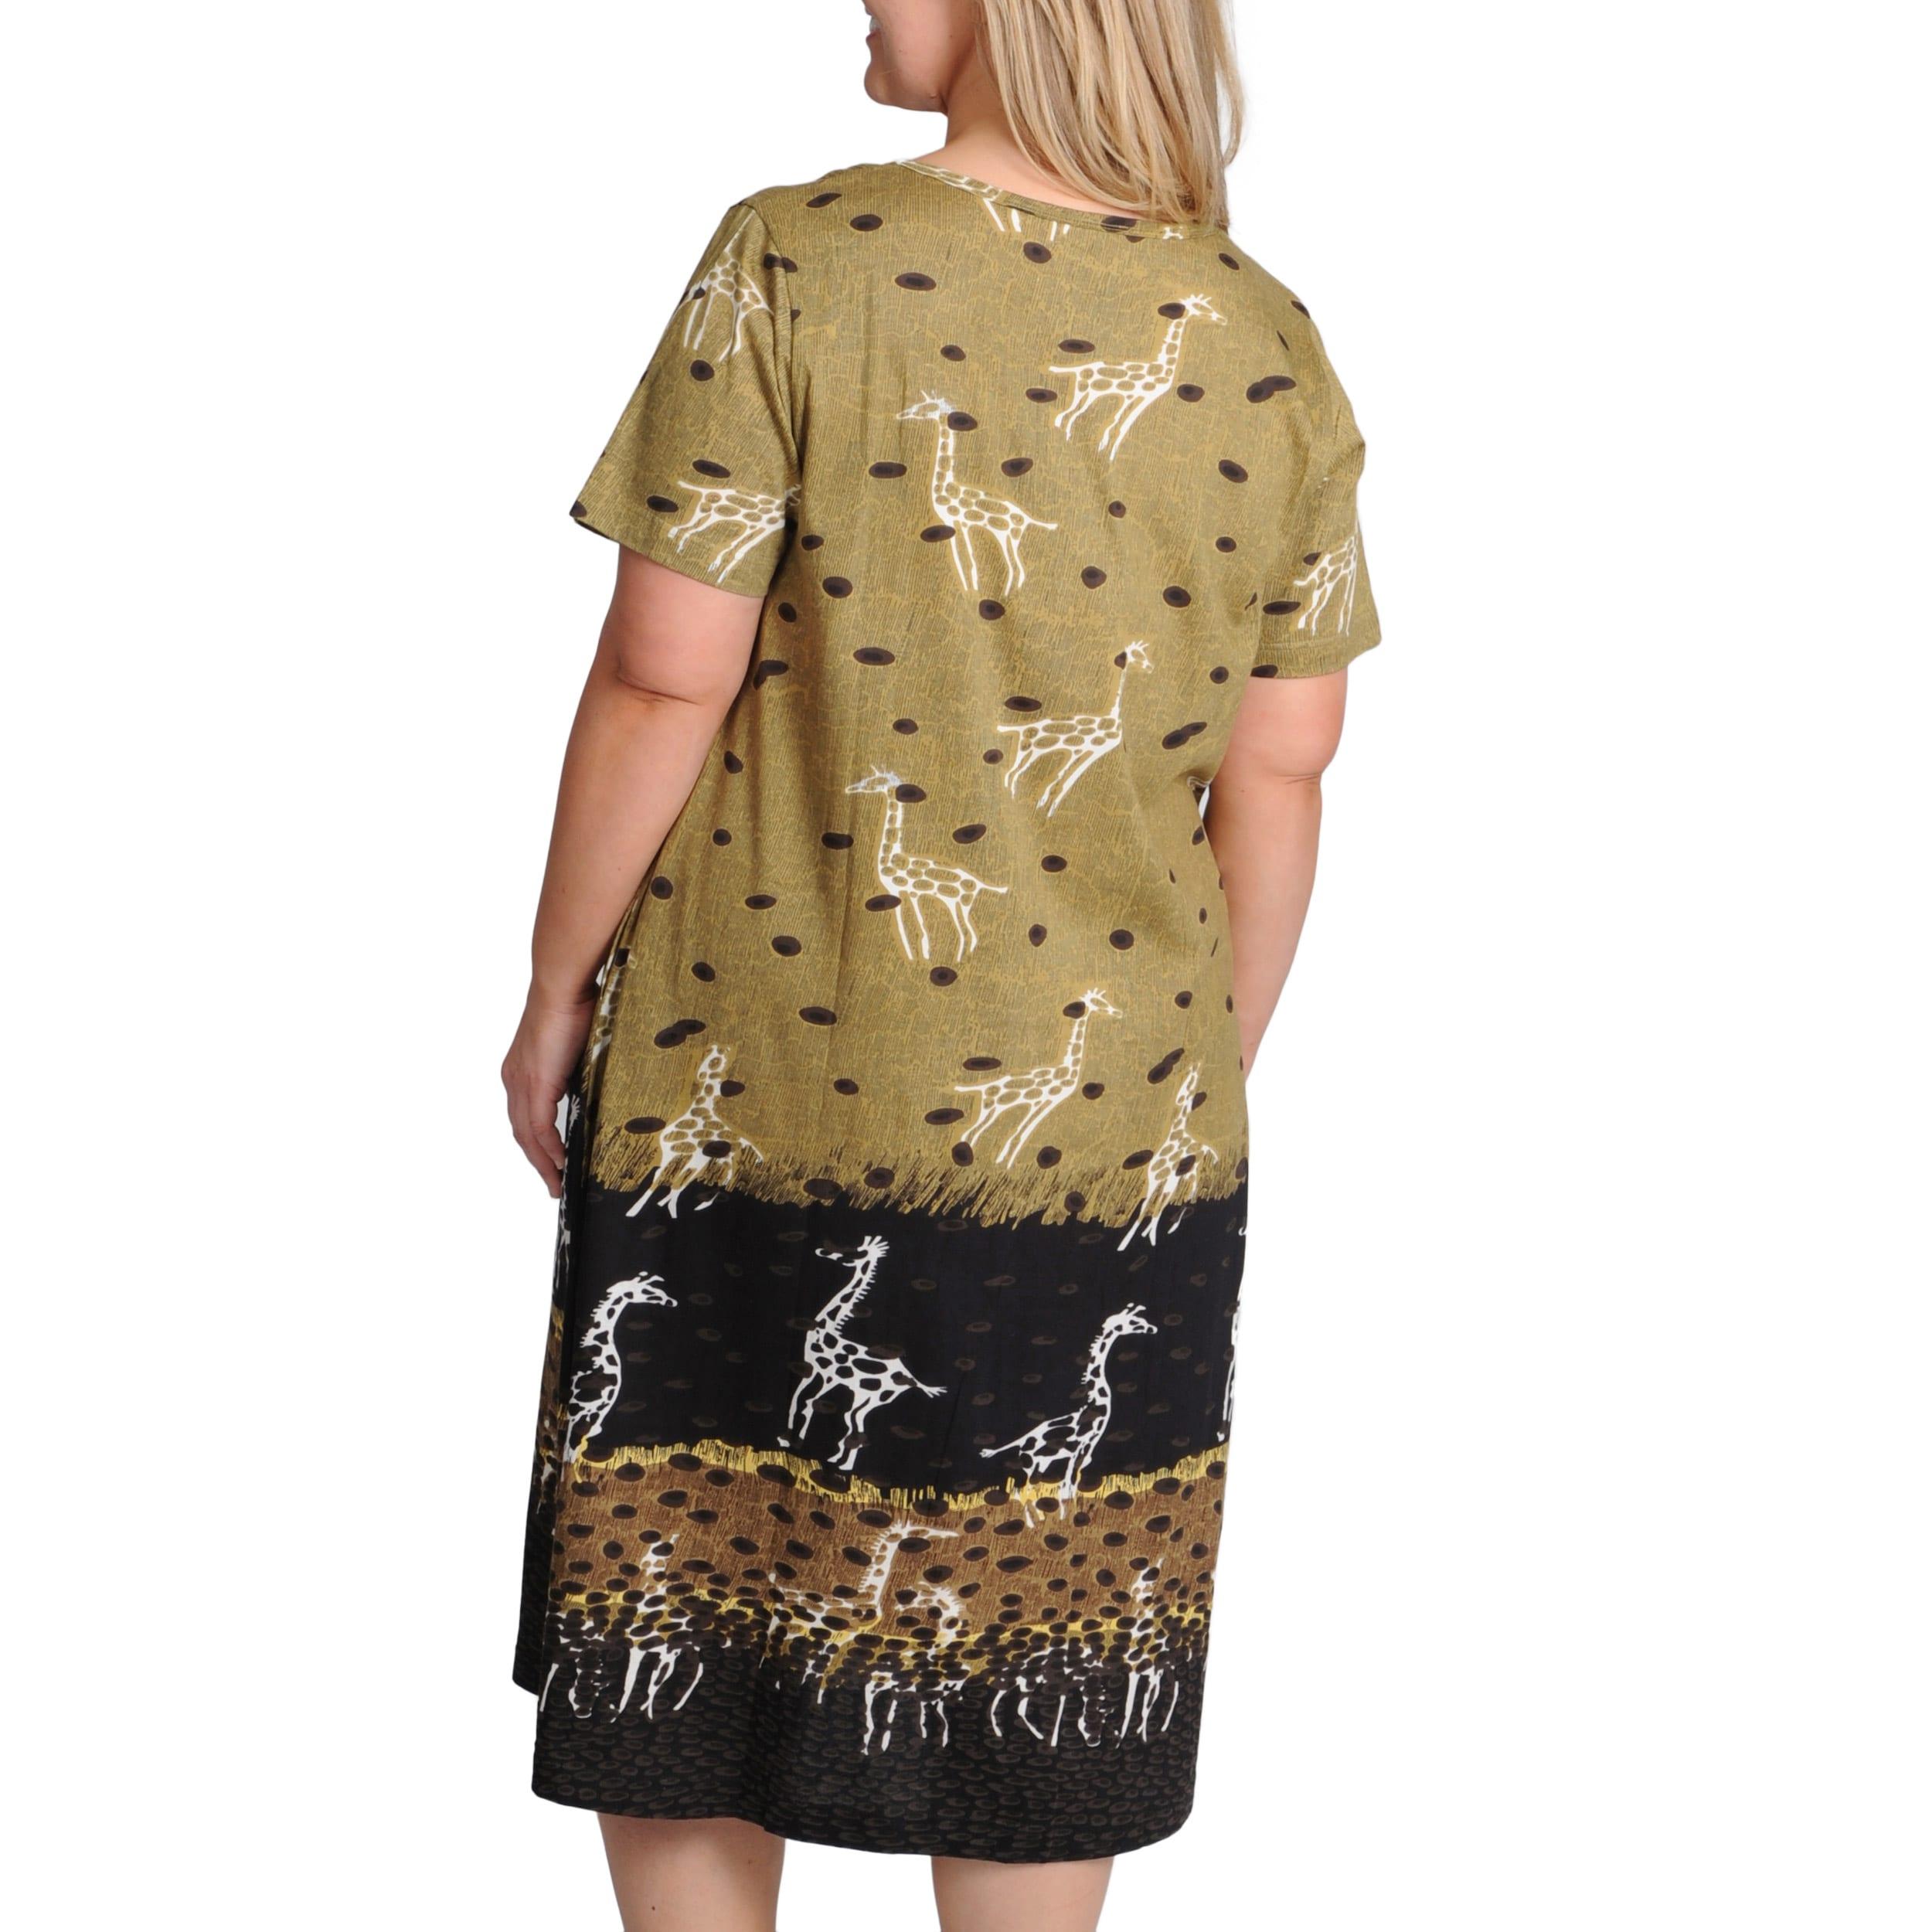 La Cera Womens Plus Size Giraffe Print A Line Knit Dress Free